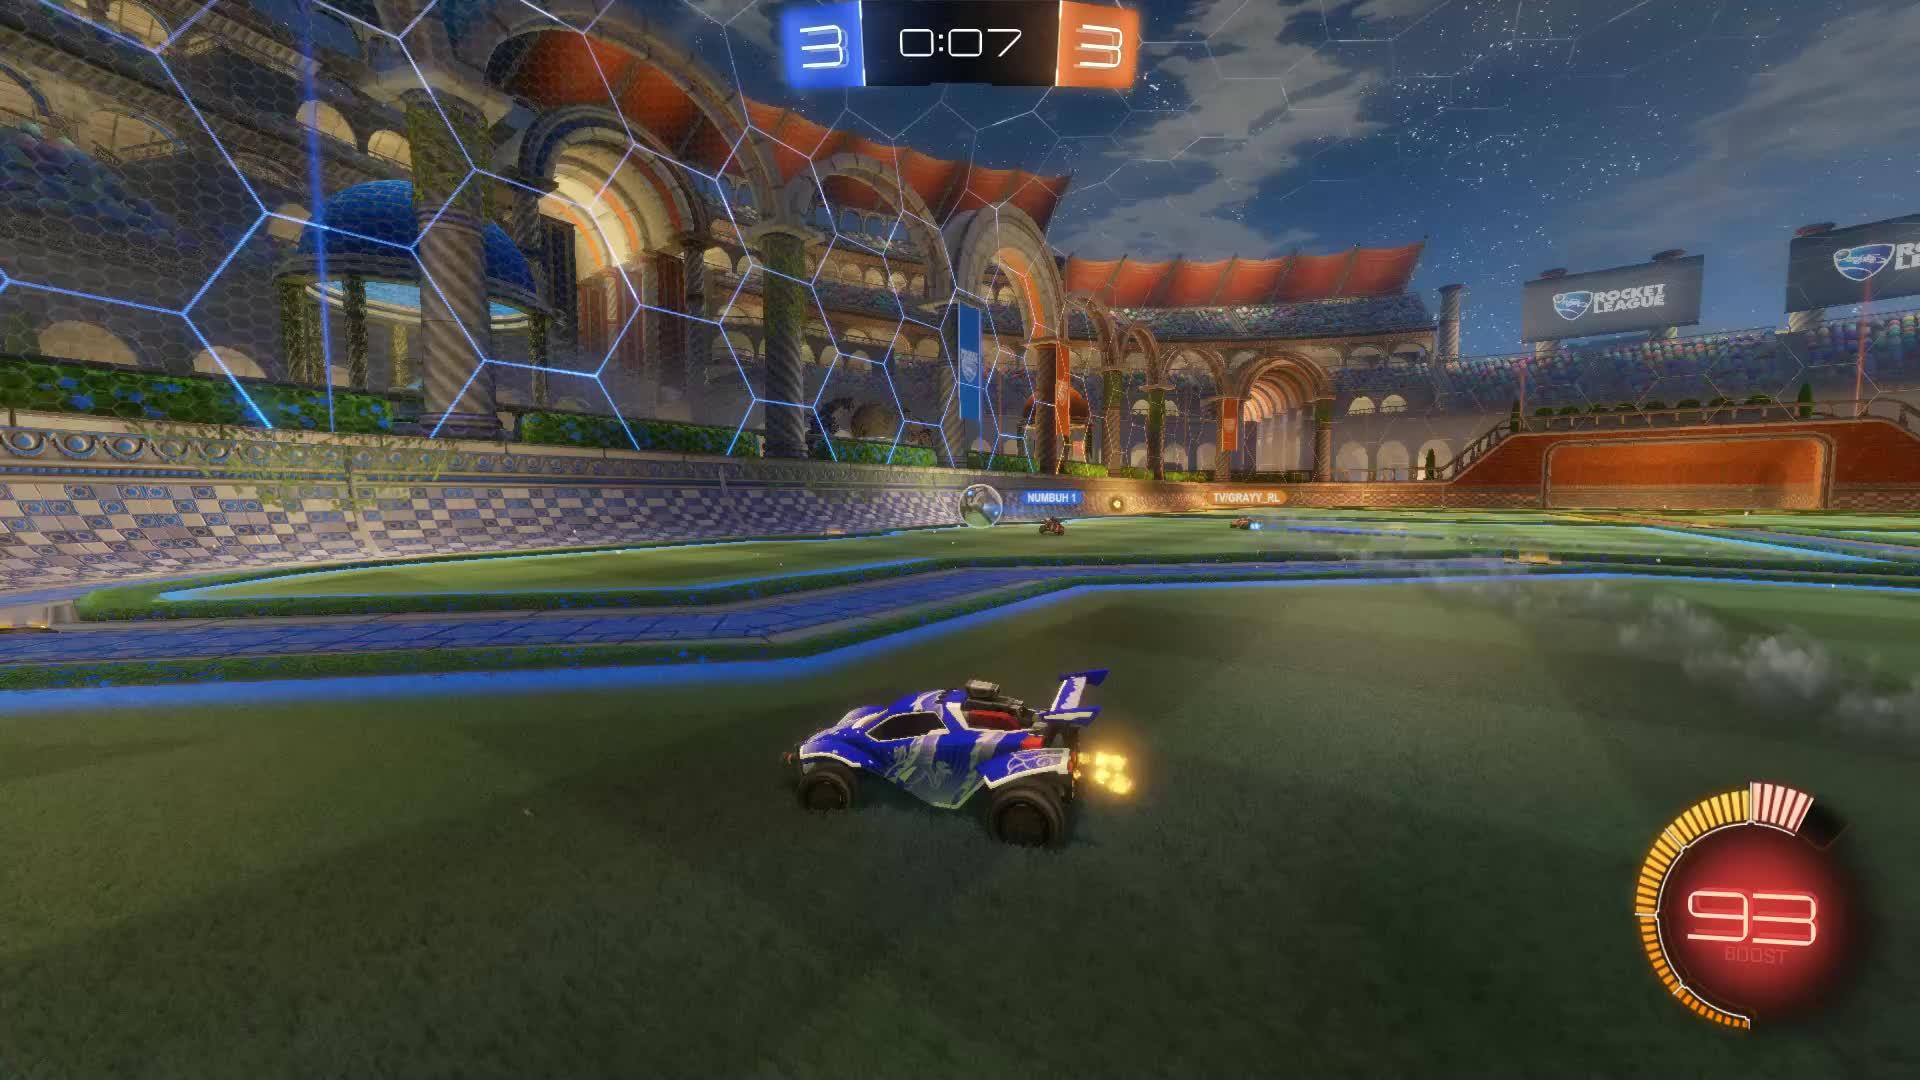 Gif Your Game, GifYourGame, Goal, Rocket League, RocketLeague, chewy, Goal 7: tv/grayy_rl GIFs